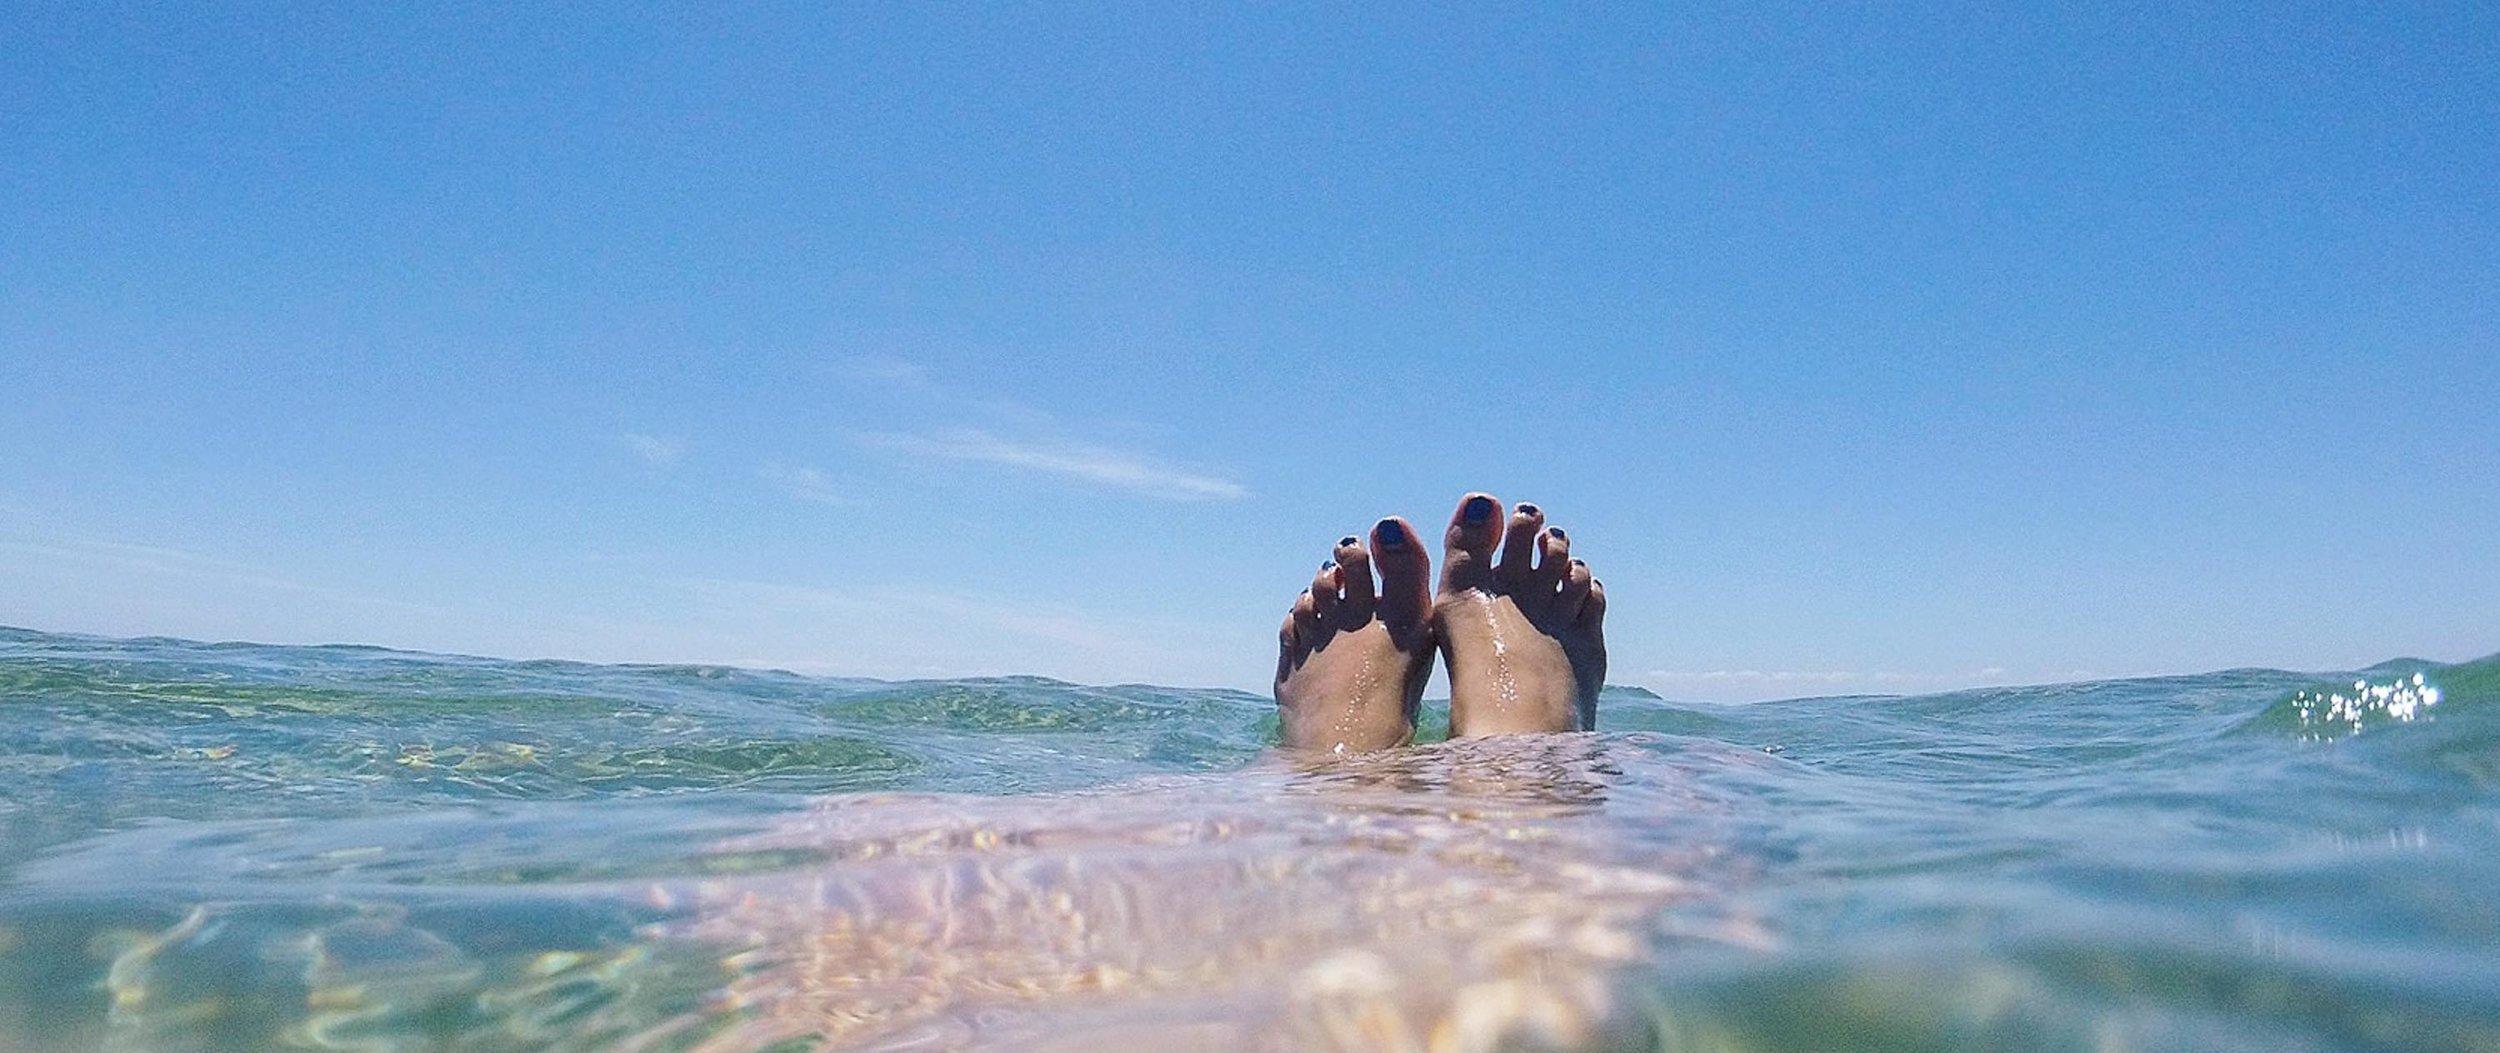 The beach near Tess Ley's home in Melbourne, Australia (Photo courtesy Tess Ley)